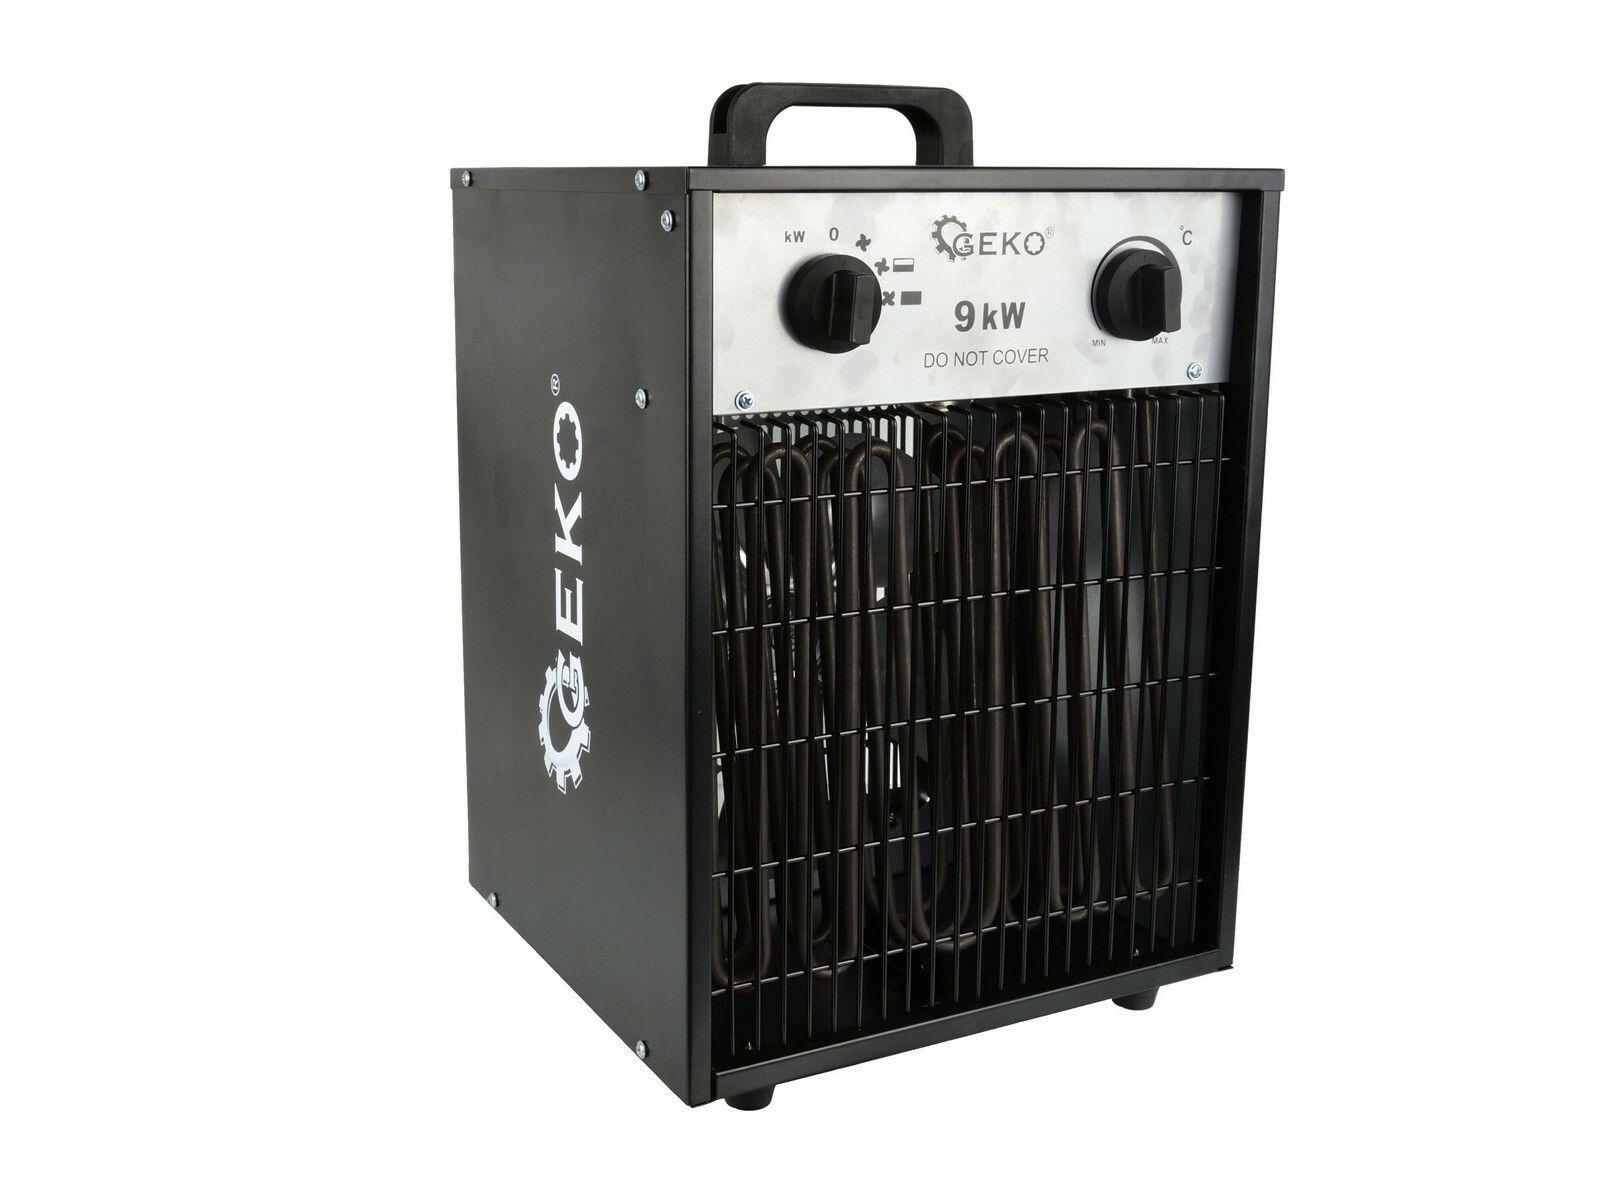 Elektrický ohřívač vzduchu s ventilátorem 9kW